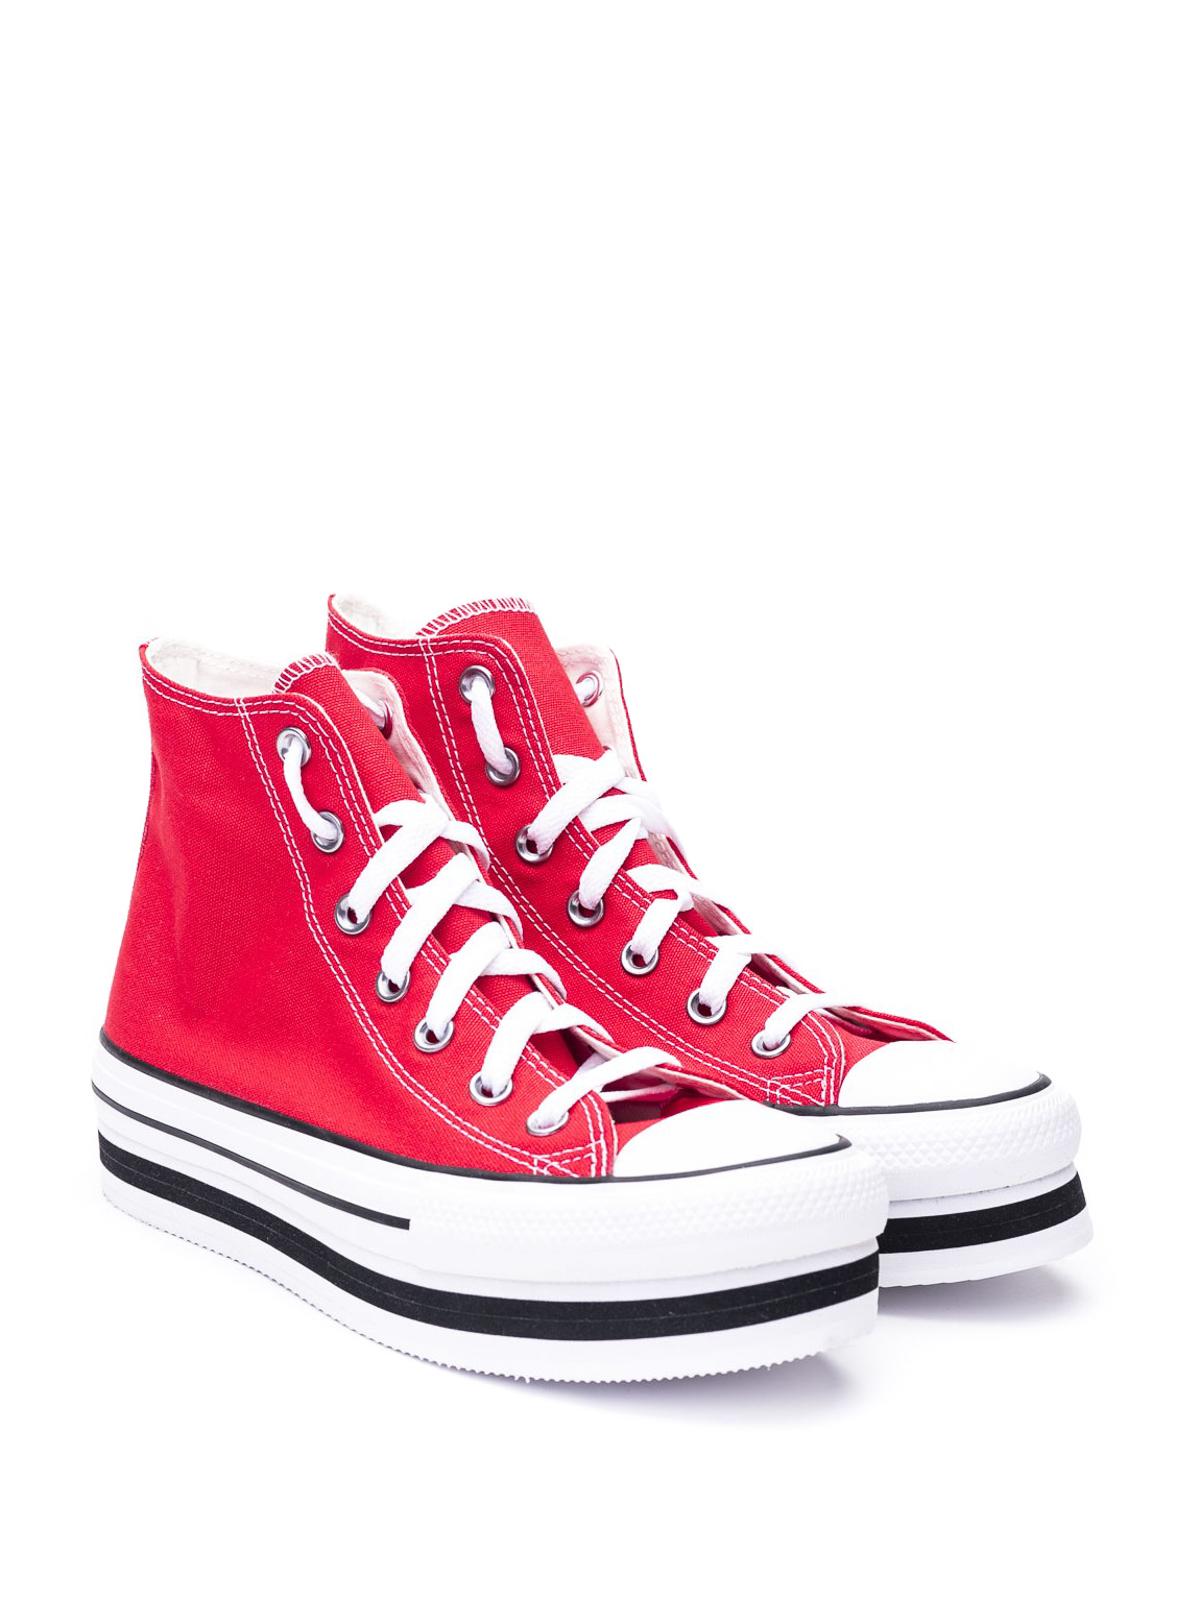 Converse - Chuck Taylor Platform red